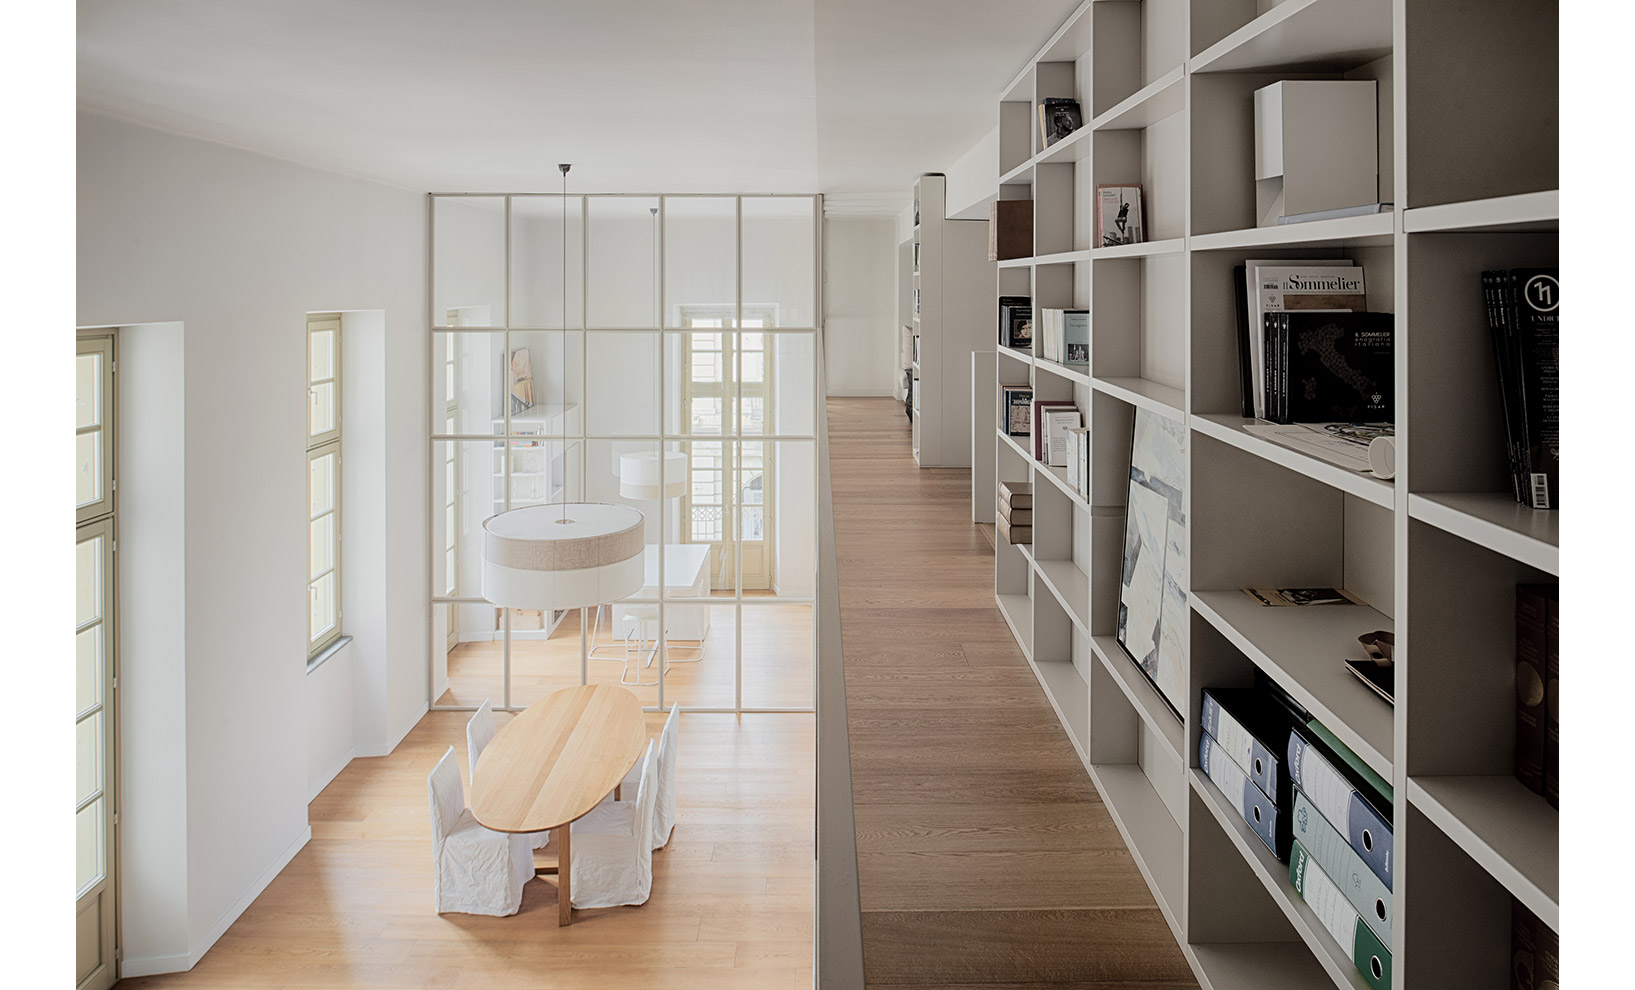 marco-tacchini-fotografo-architettura-torino-maat-architettura_10